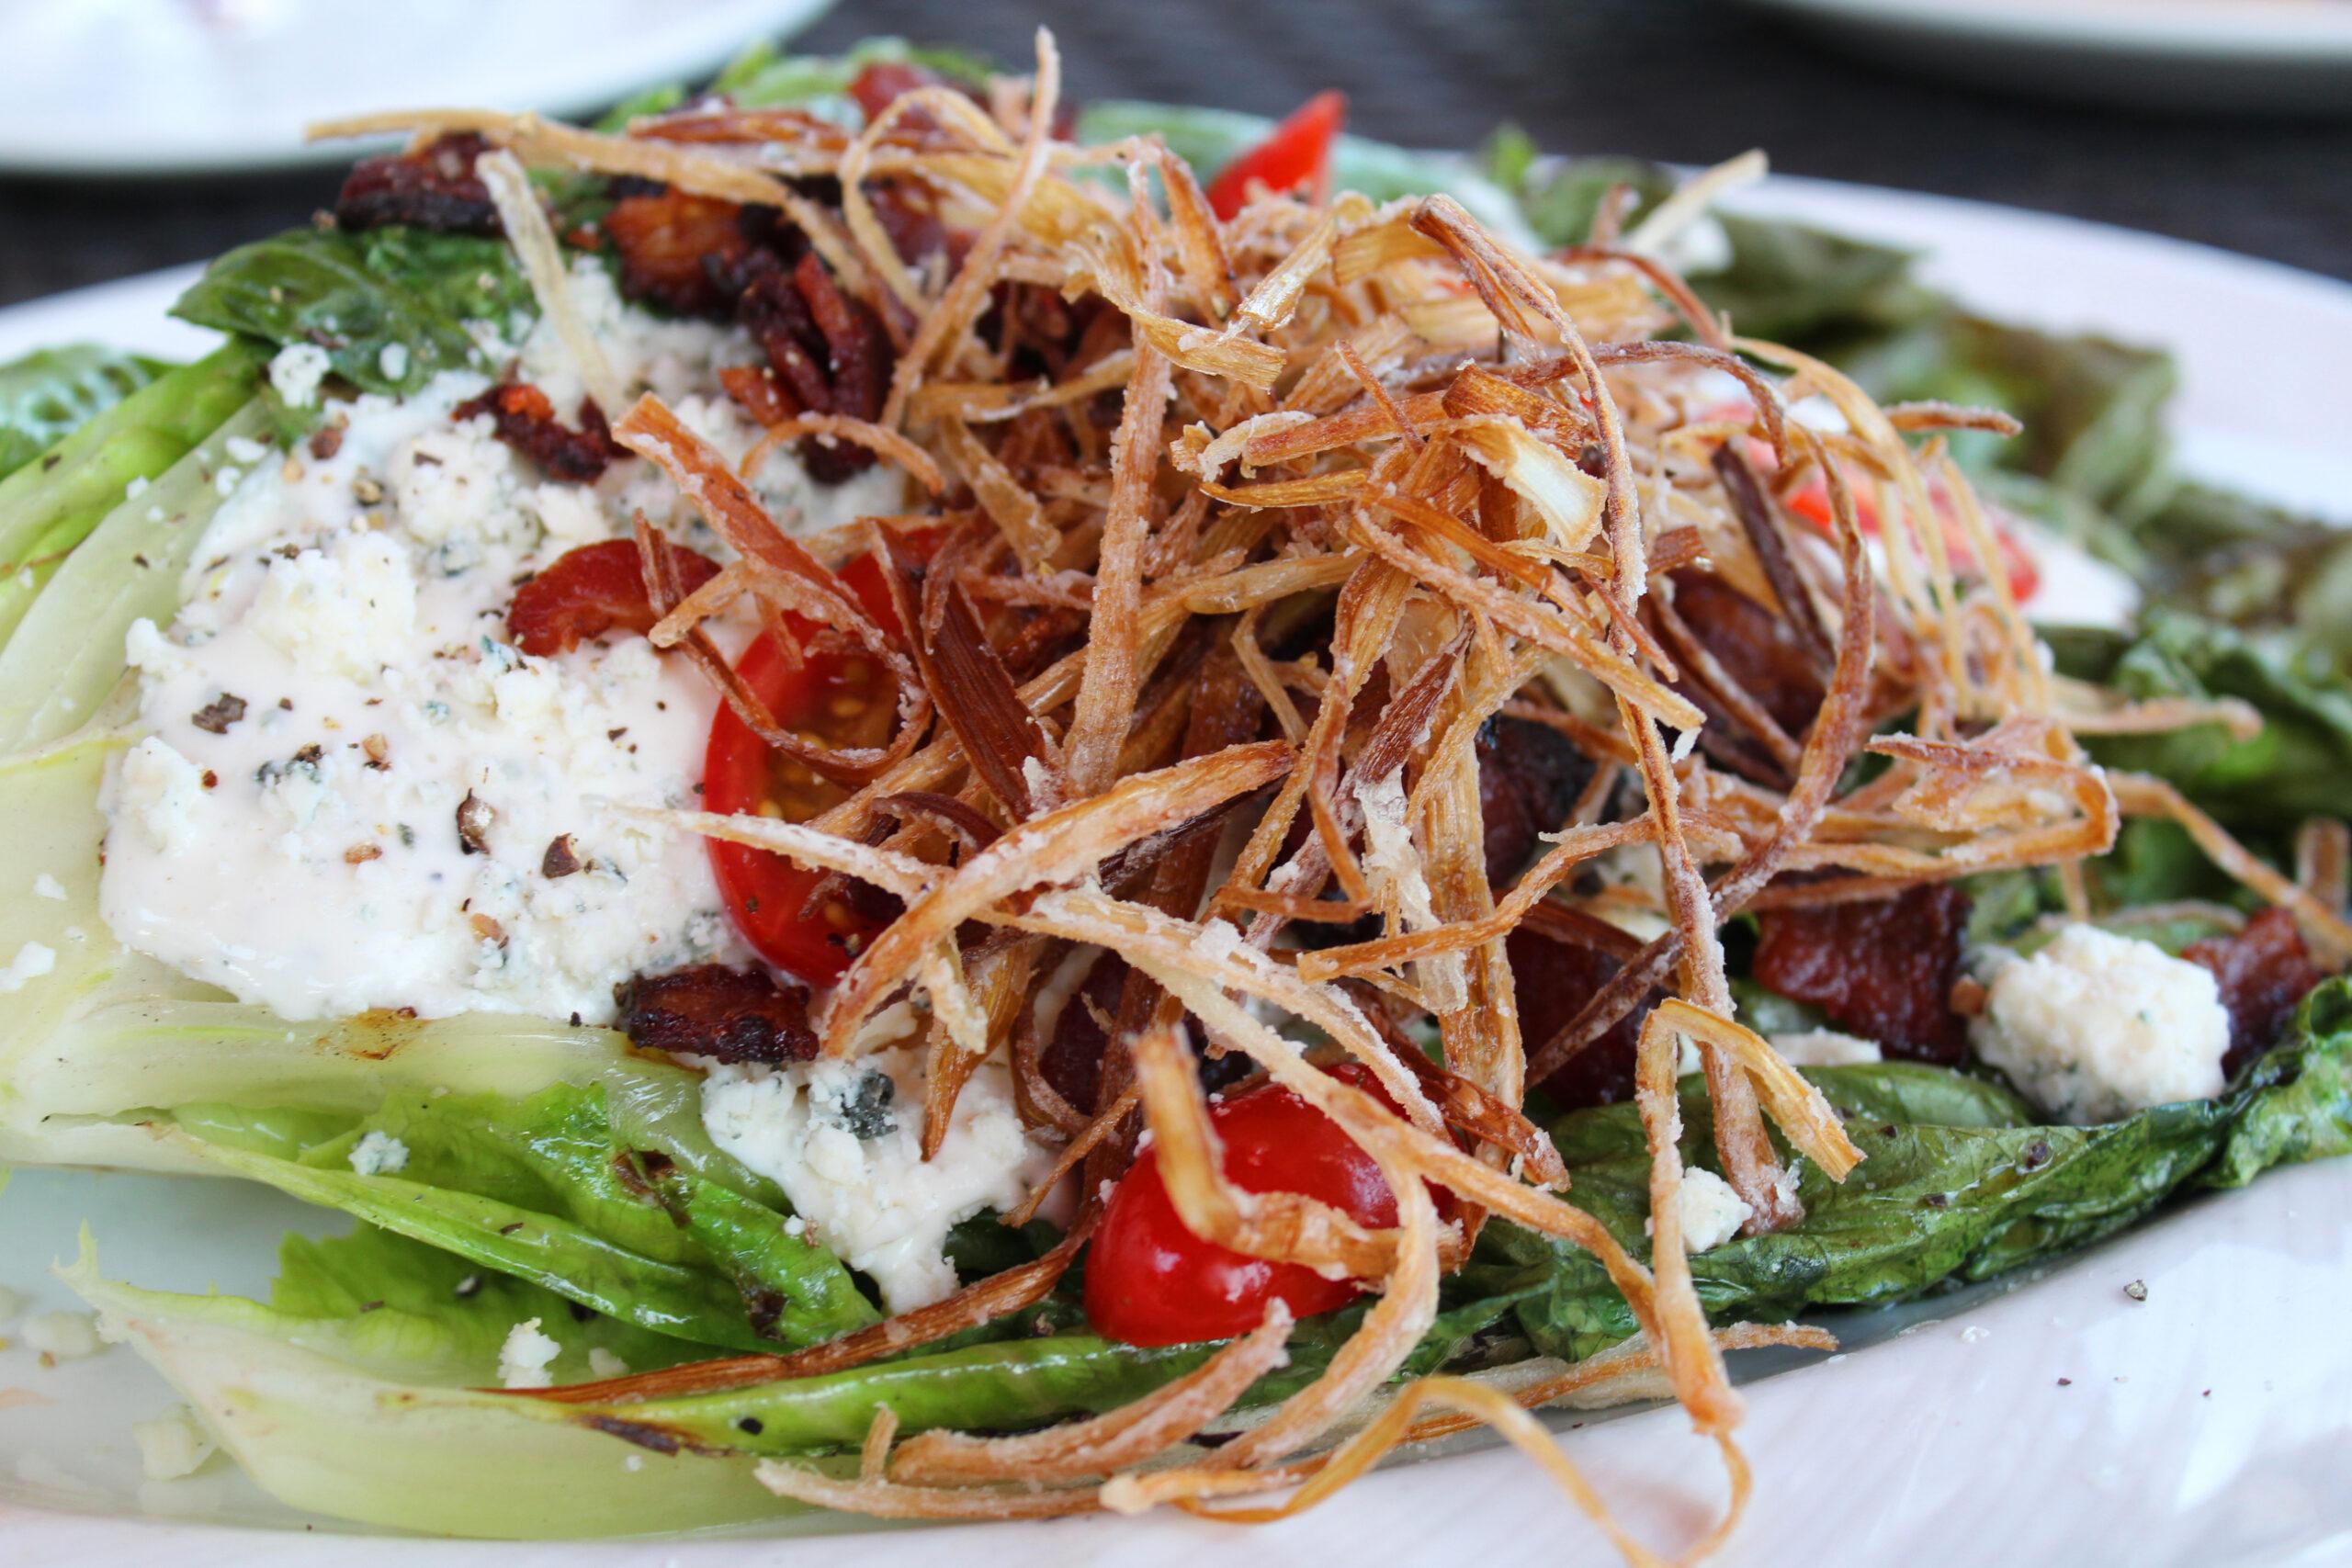 upscale steak house blue cheese salad